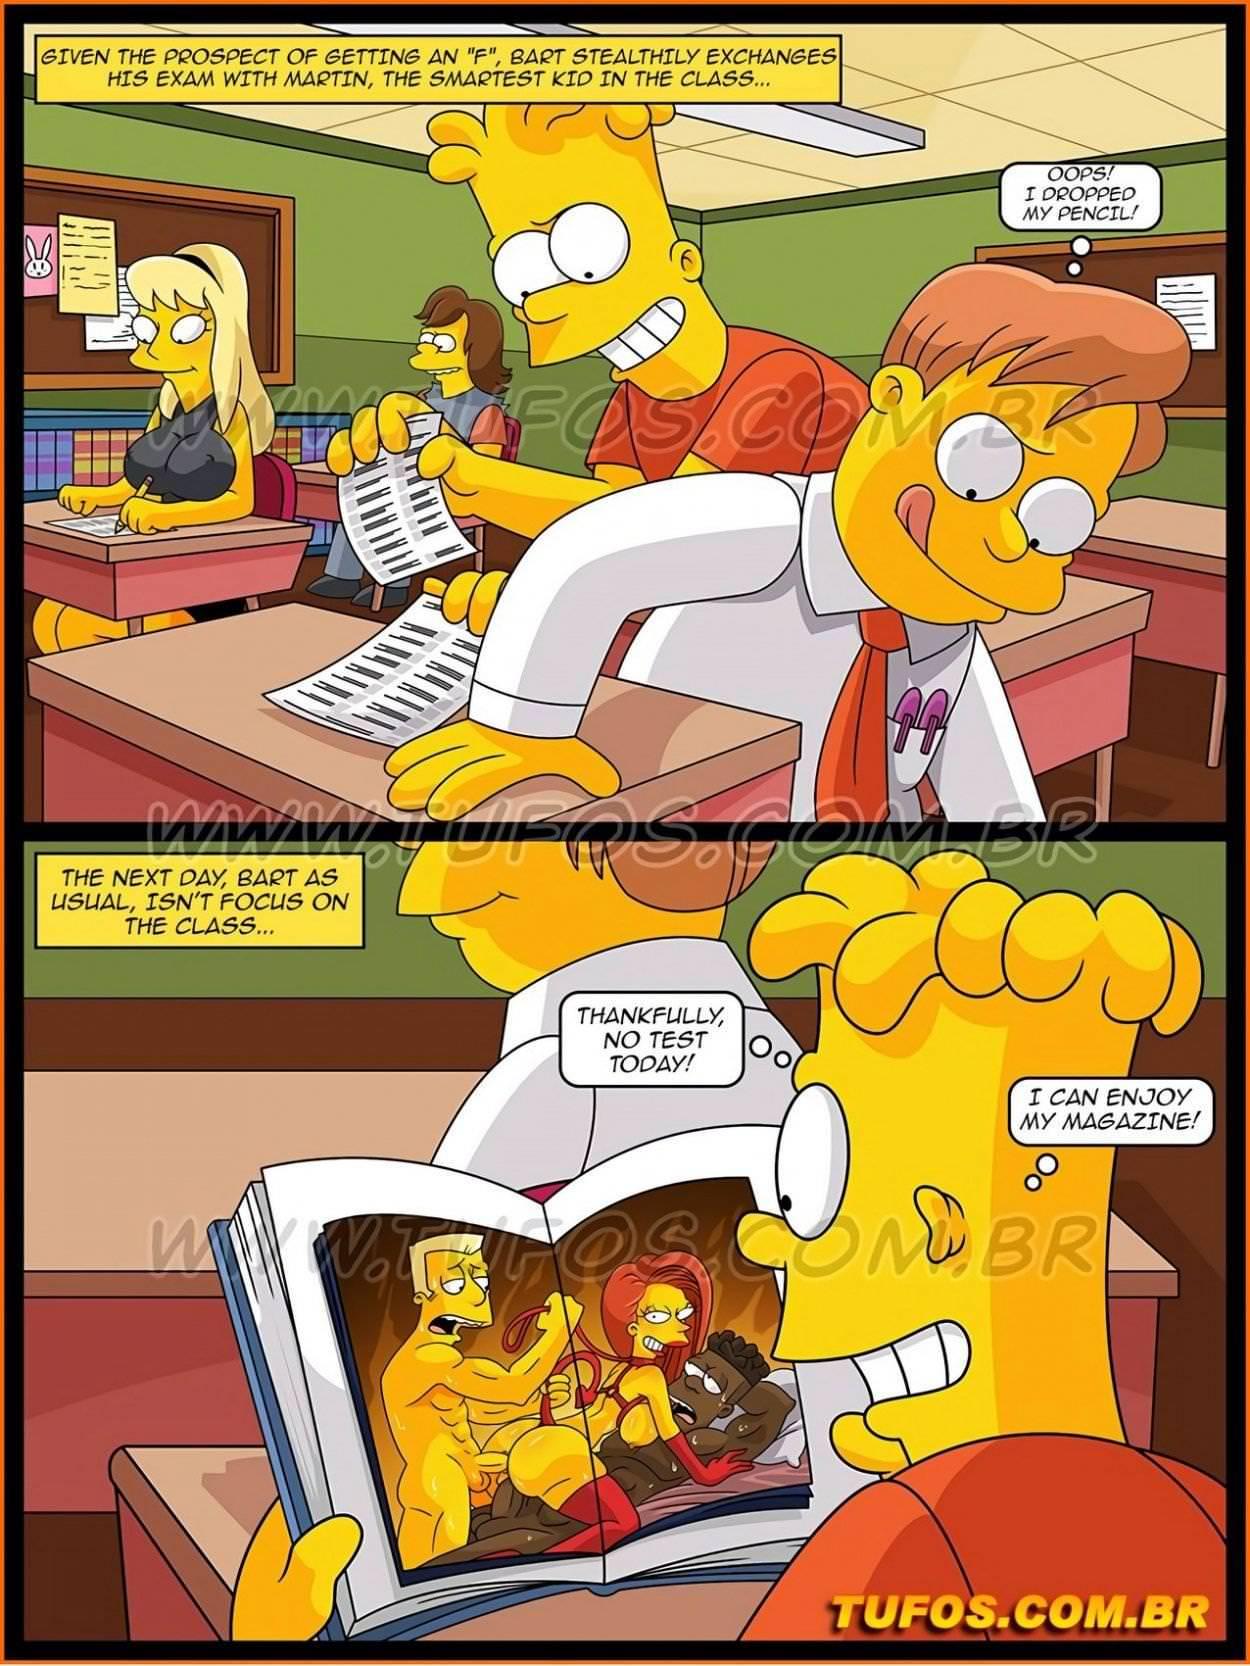 Porno die comic simpsons Popular XXX